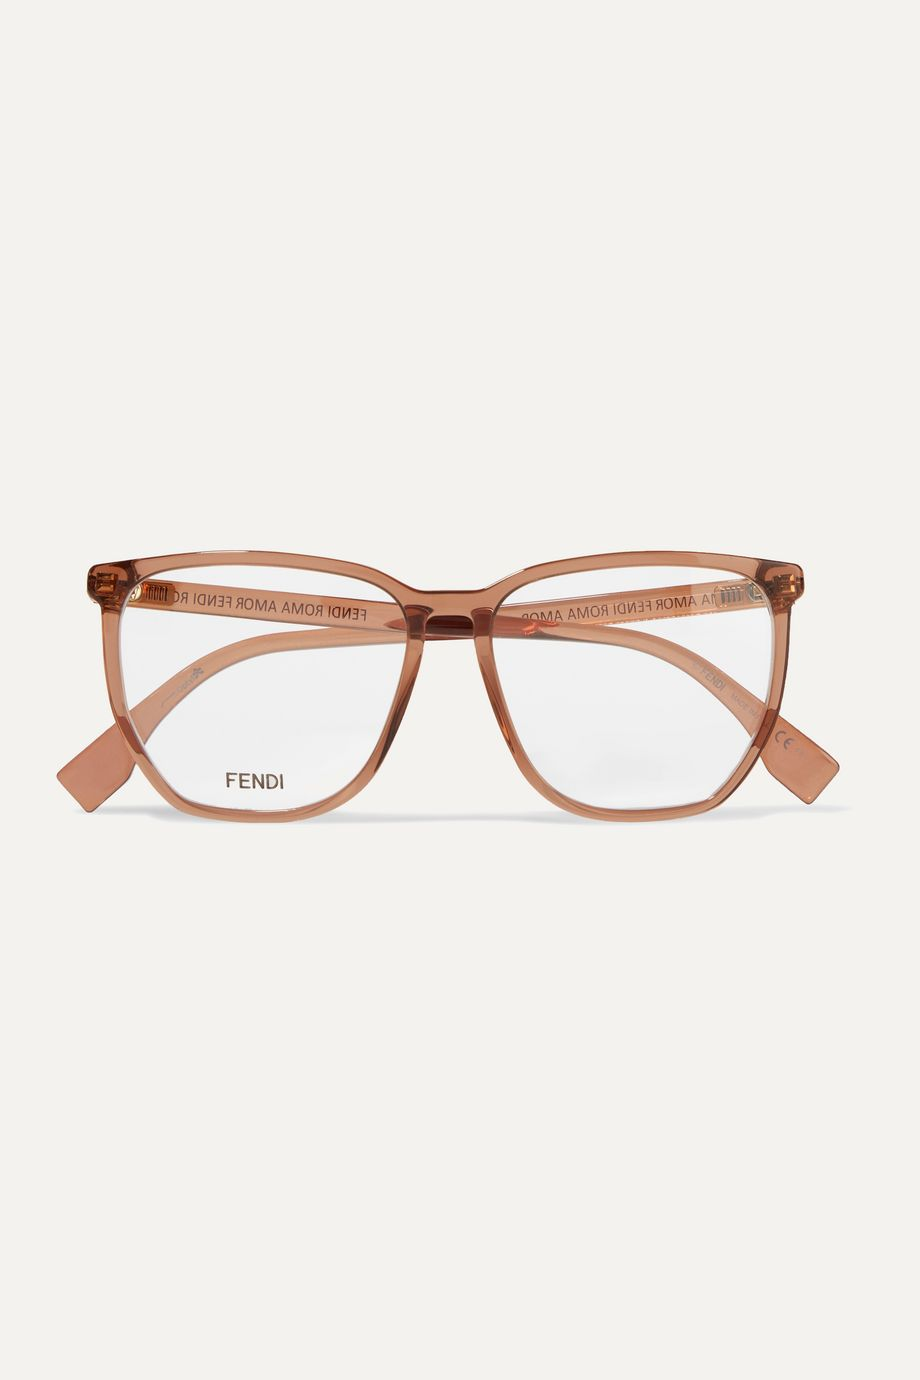 Fendi D-frame acetate optical glasses